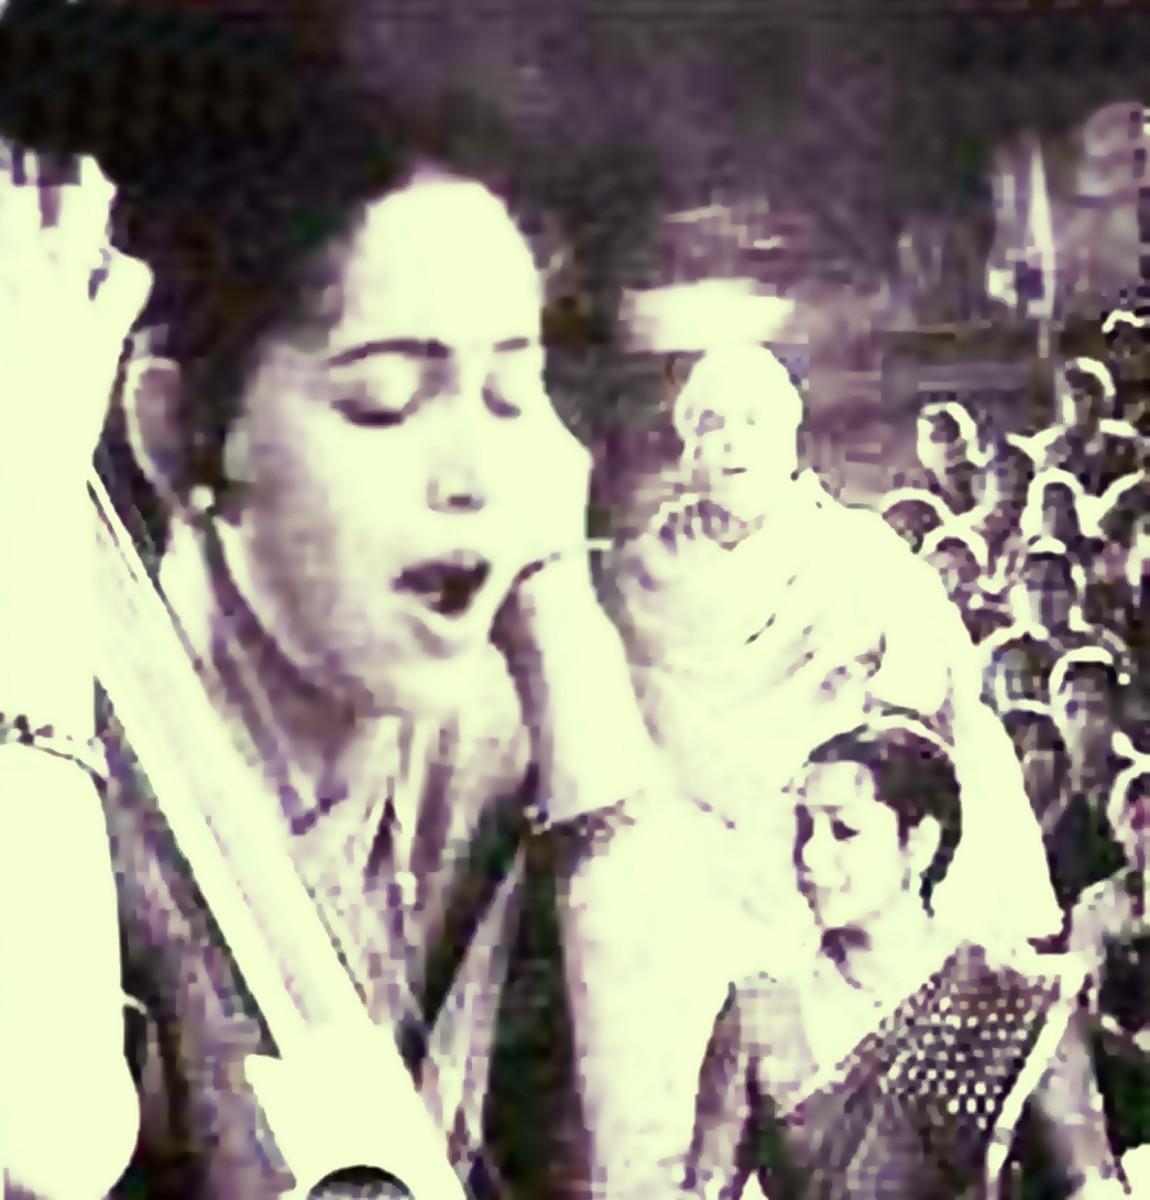 A melodious bhajan in Raag Bhupali by Kavita Krishnamurthi and Roop Singh Rathod